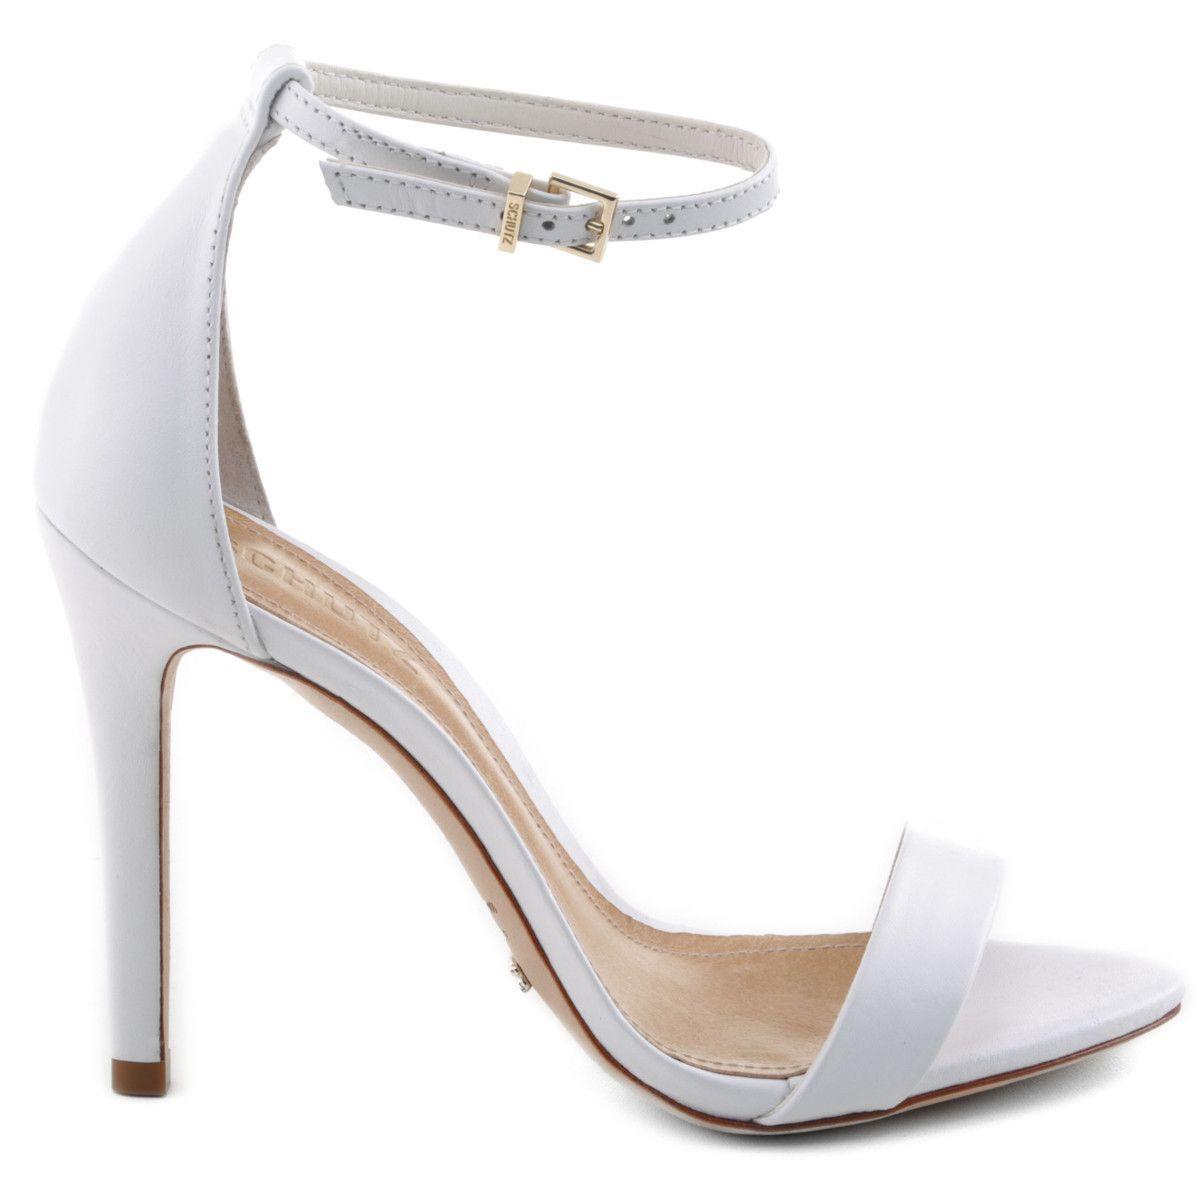 Perfect Schutz Shoes white classy high heel wedding shoes